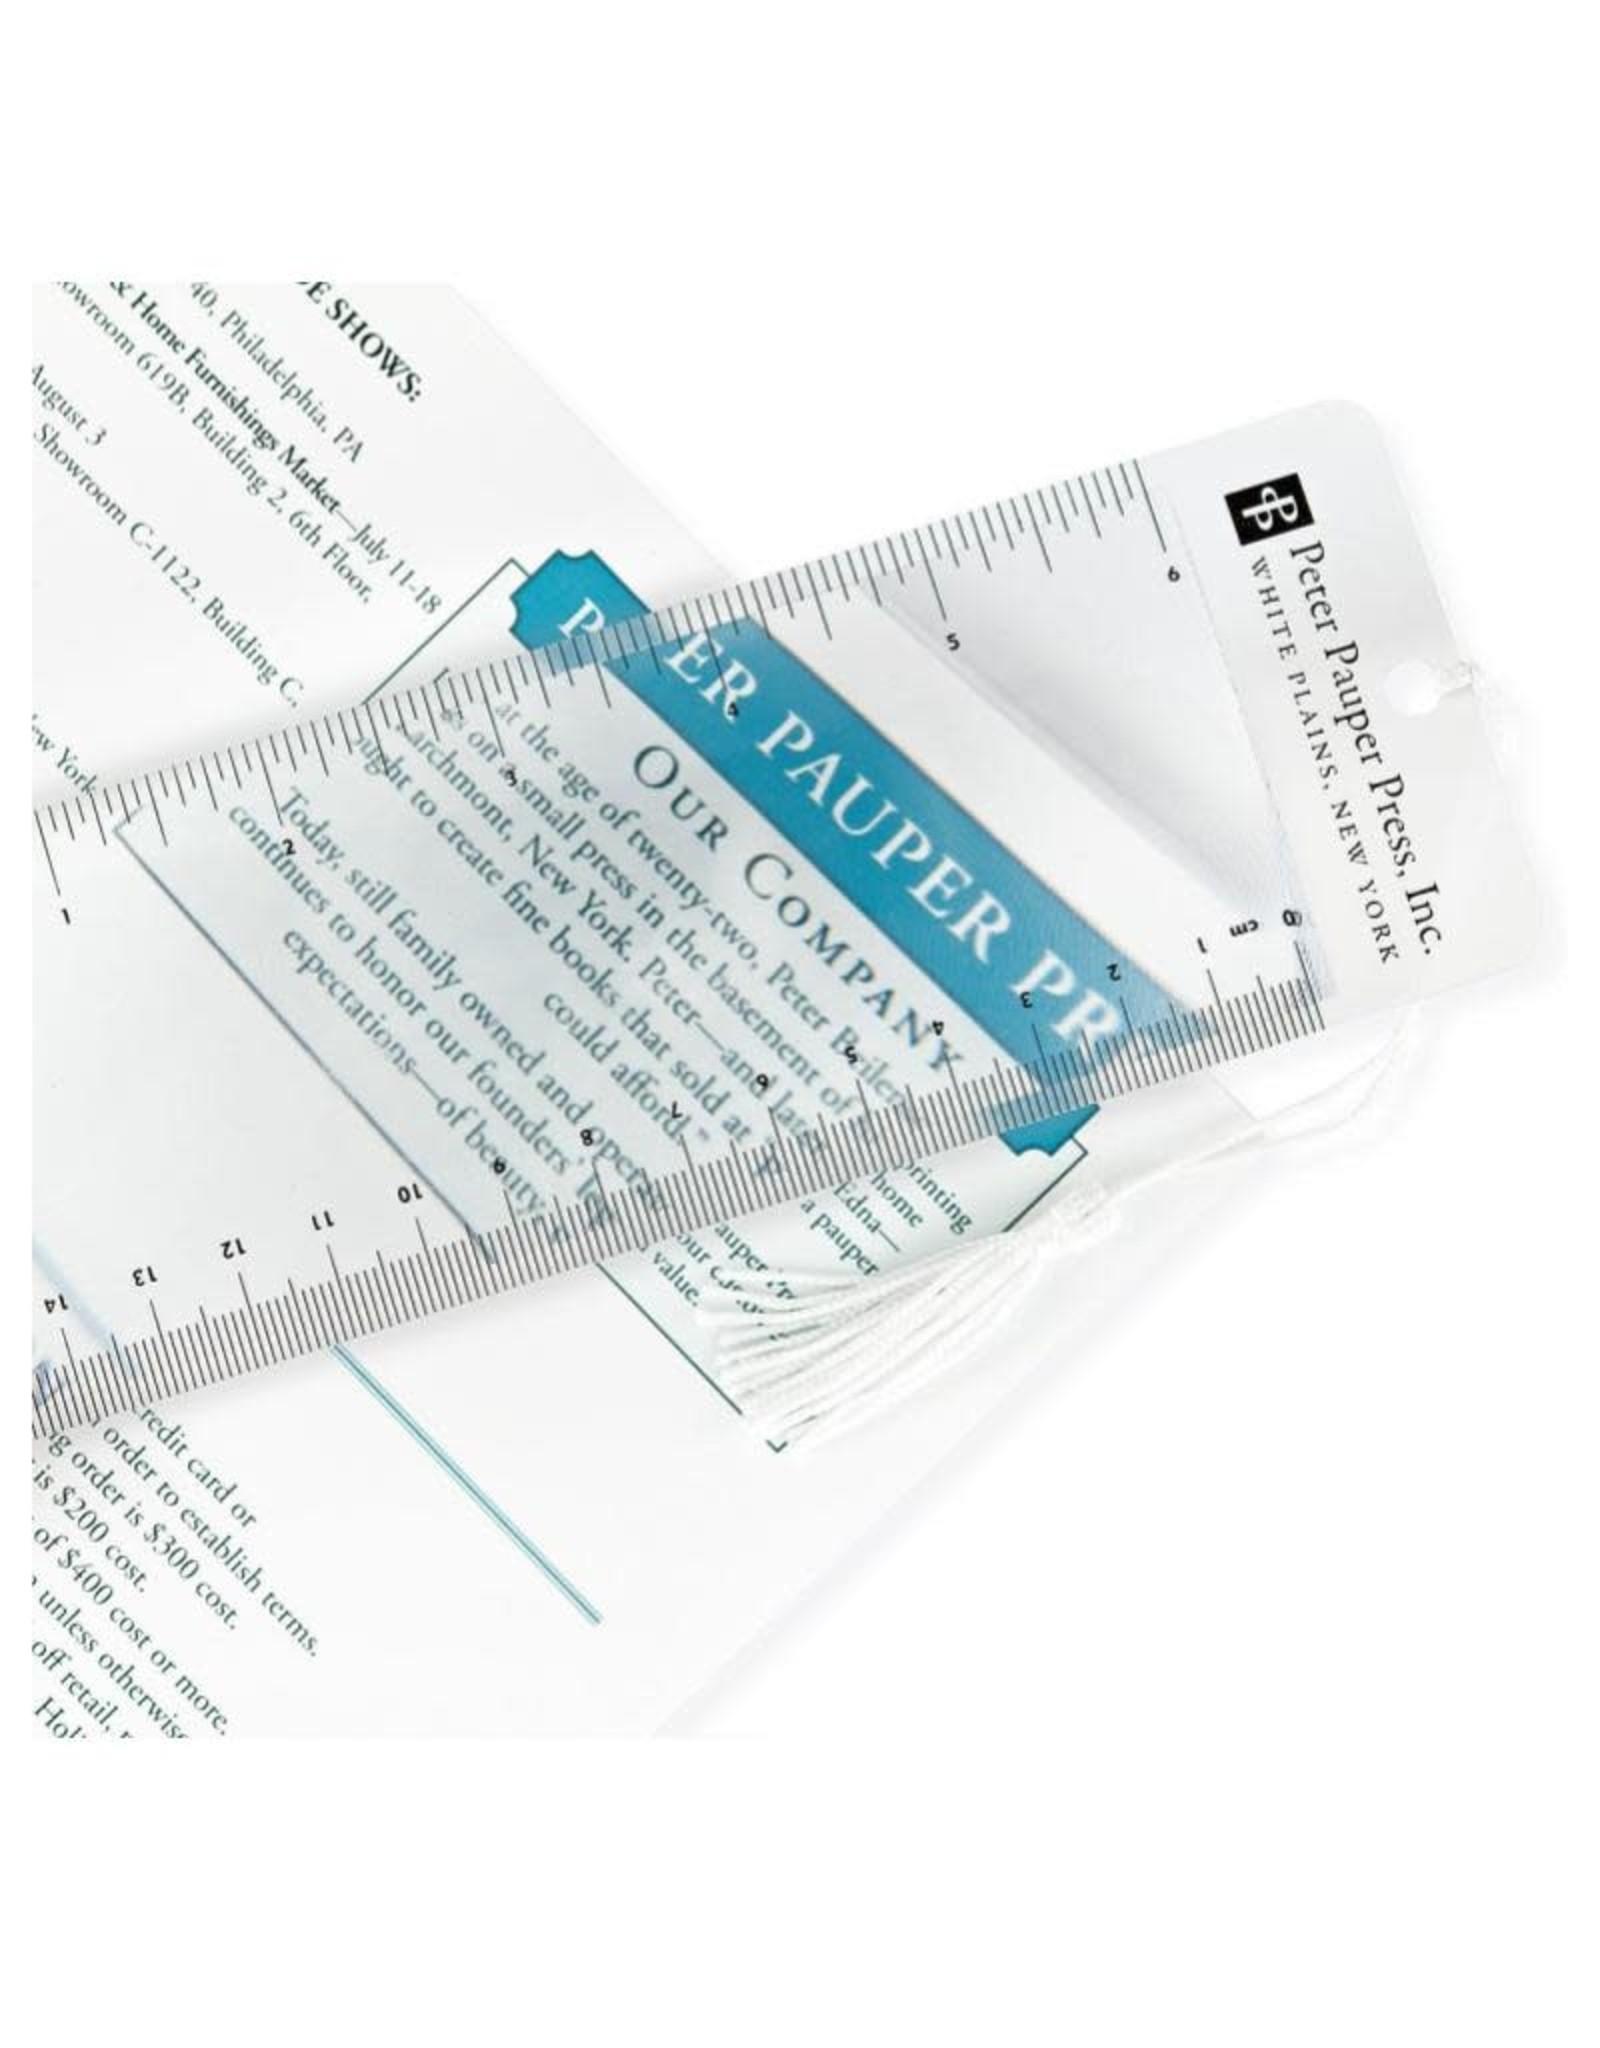 Peter Pauper Magnifier Bookmark